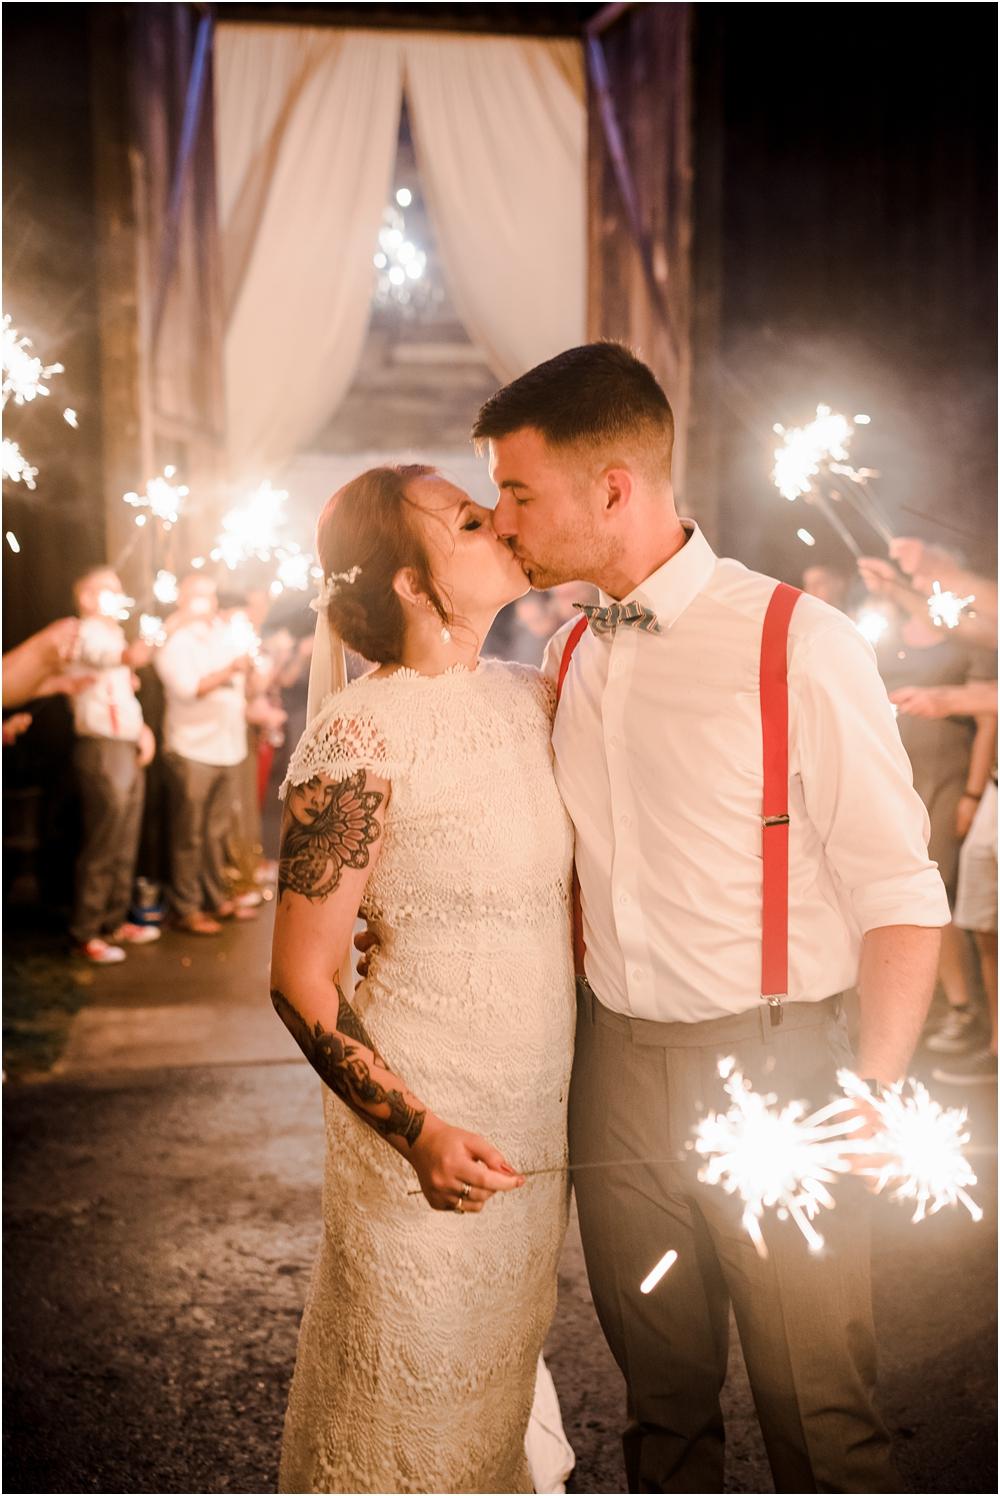 the-barn-at-wateroaks-circus-florida-wedding-photographer-kiersten-stevenson-photography-166.jpg